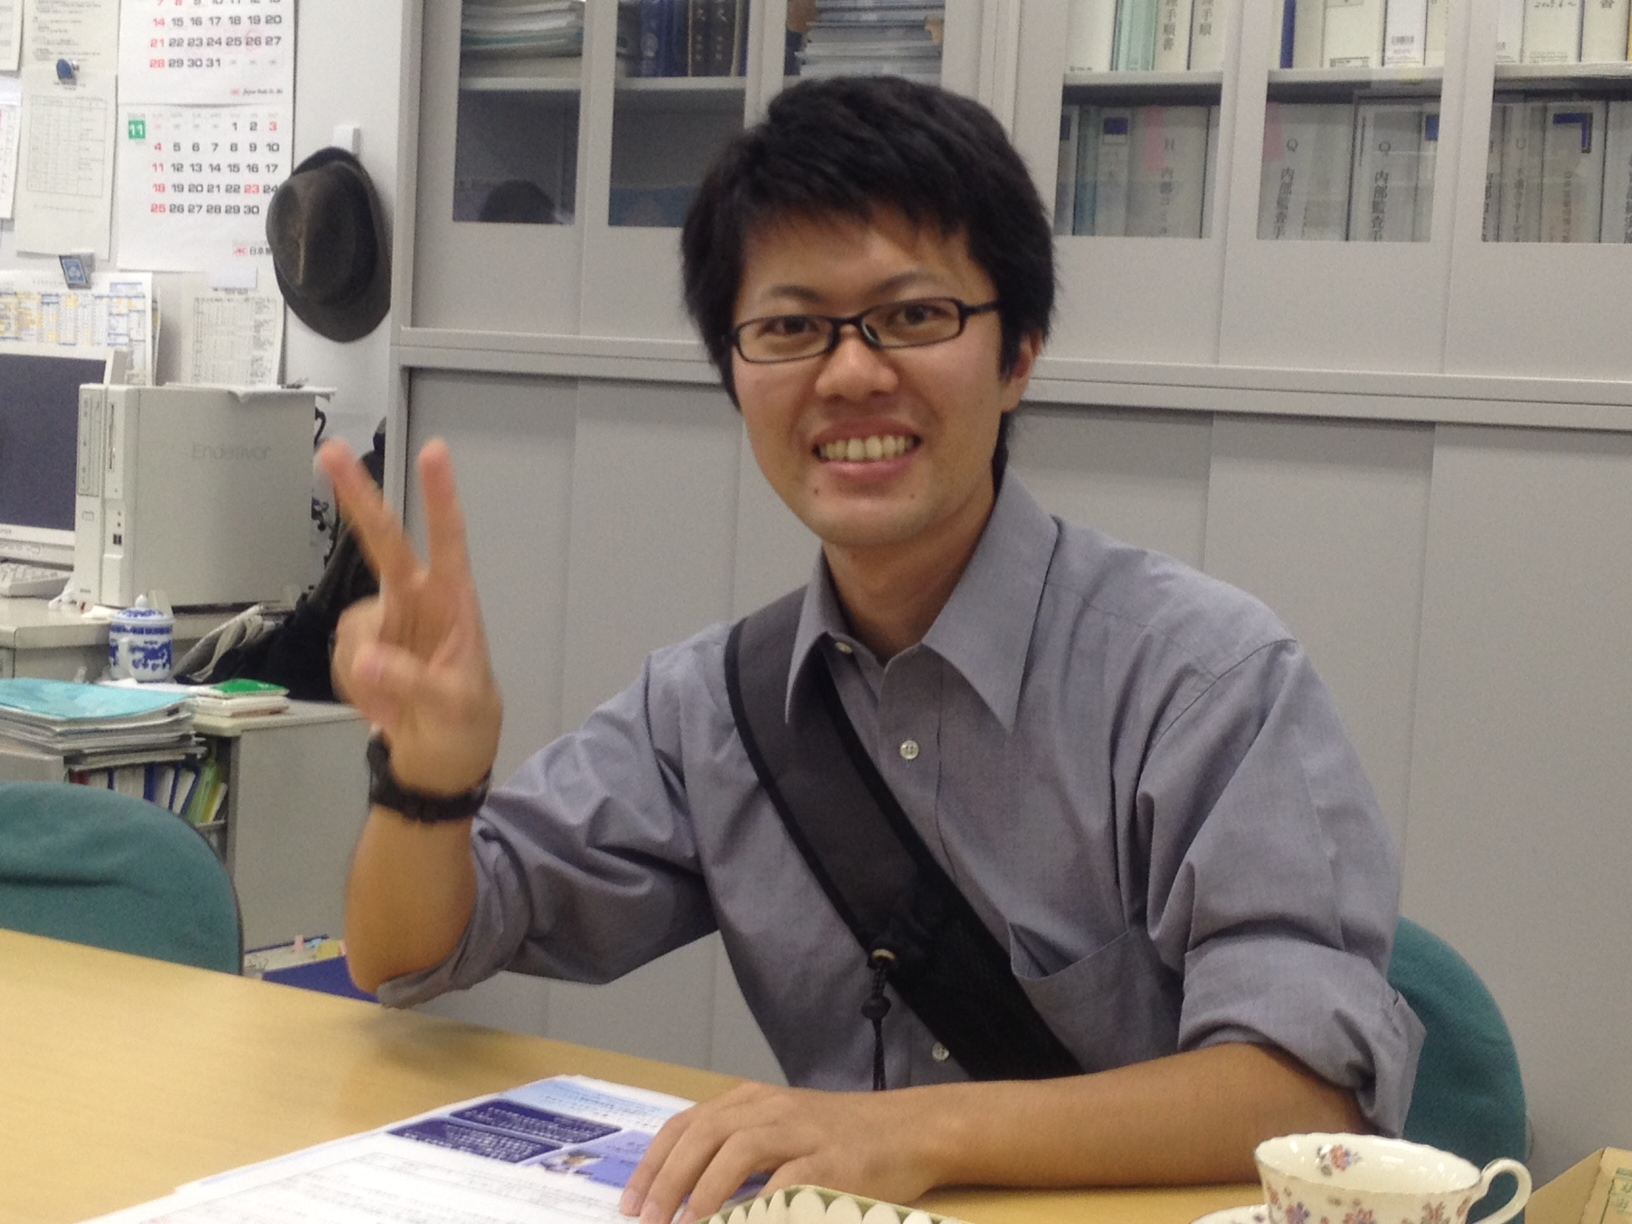 sato-san10.19.2.JPG